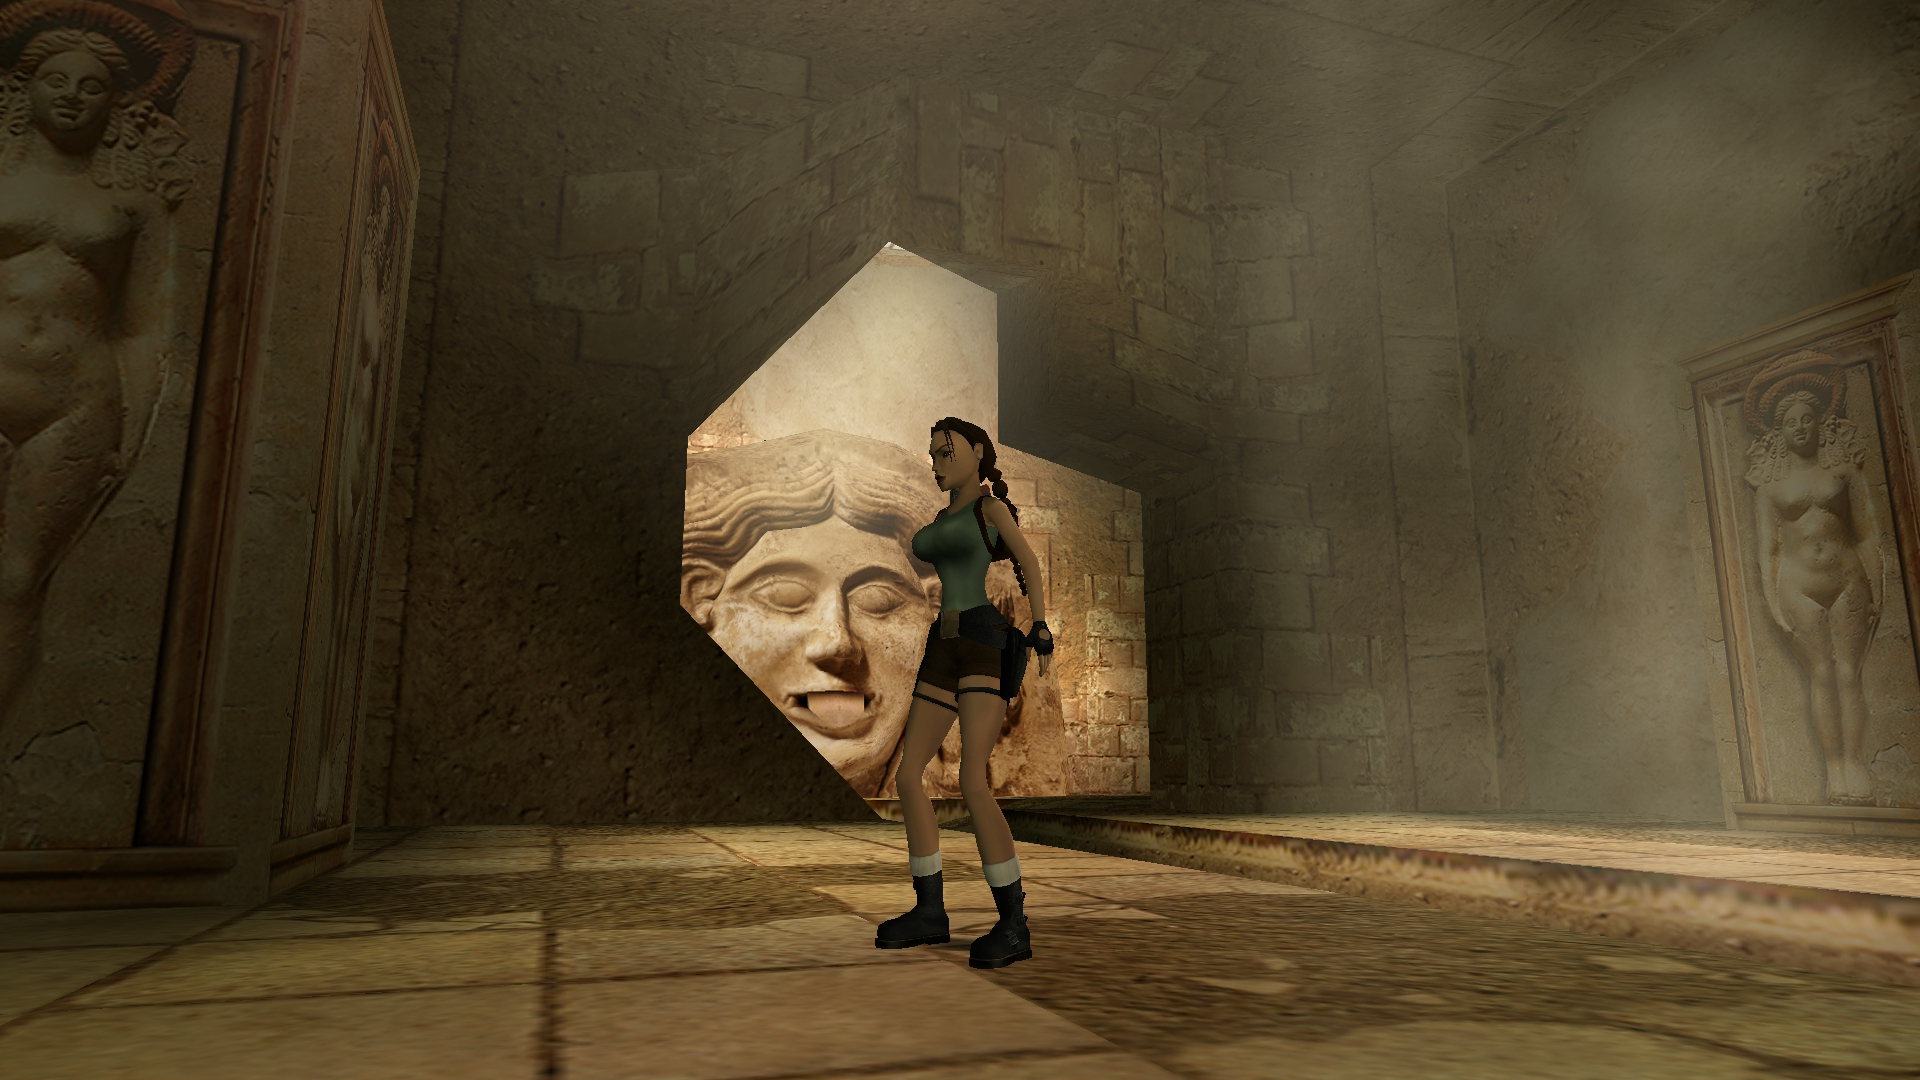 Tomb Raider 4 - Temple of Poseidon Remastered